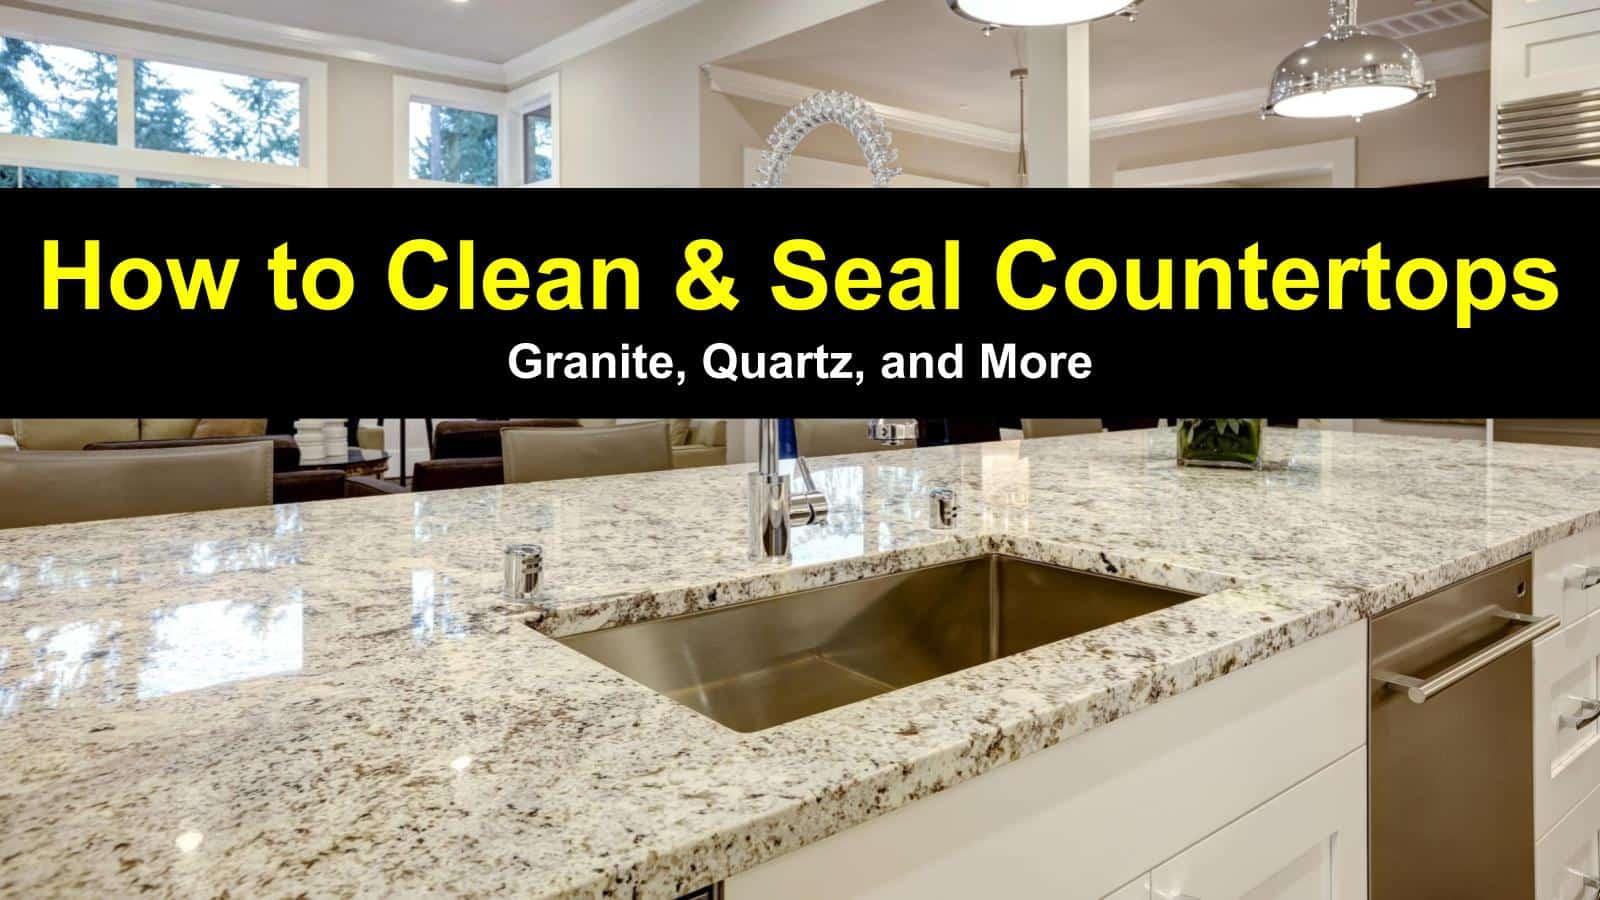 Do Quartz Tiles Need Sealing